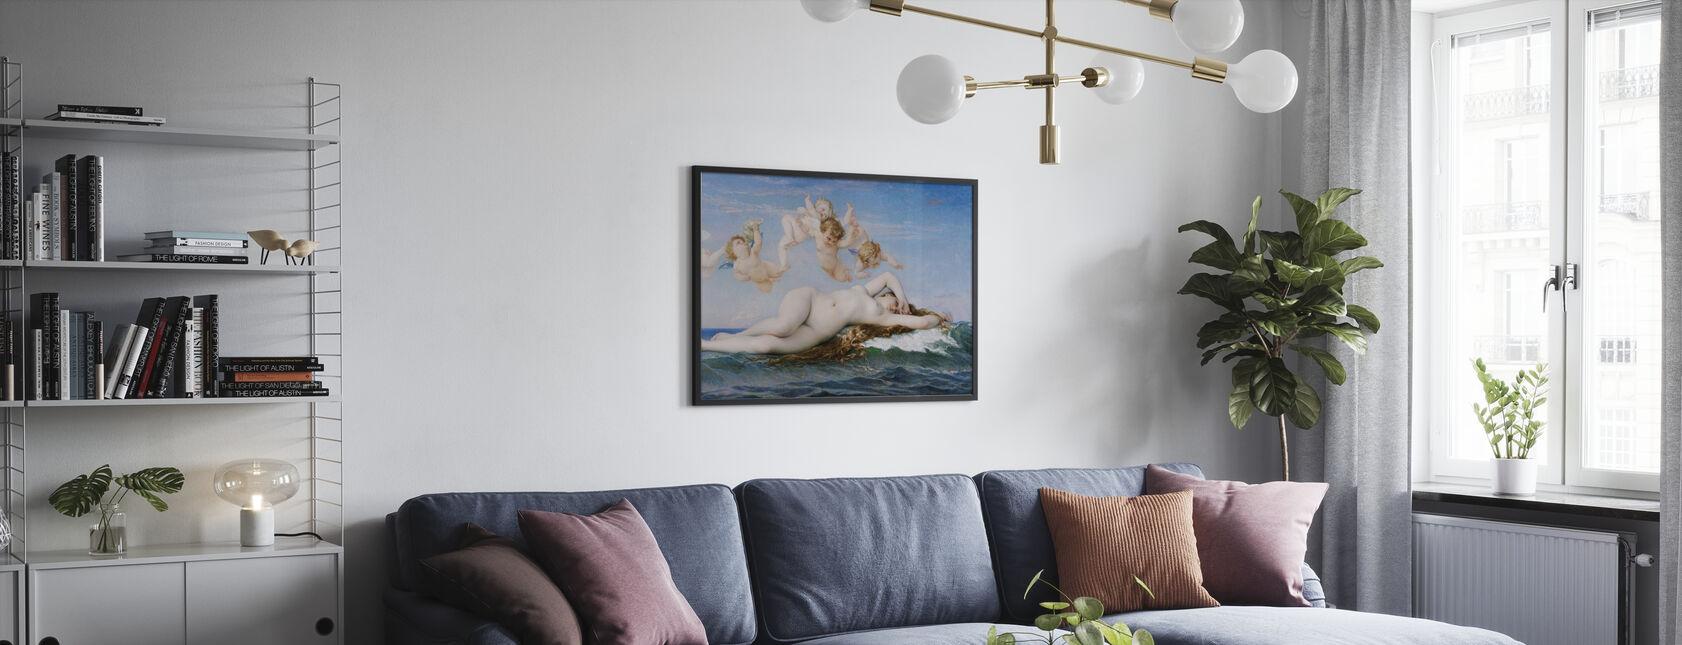 Birth of Venus, Alexandre Cabanel - Poster - Living Room